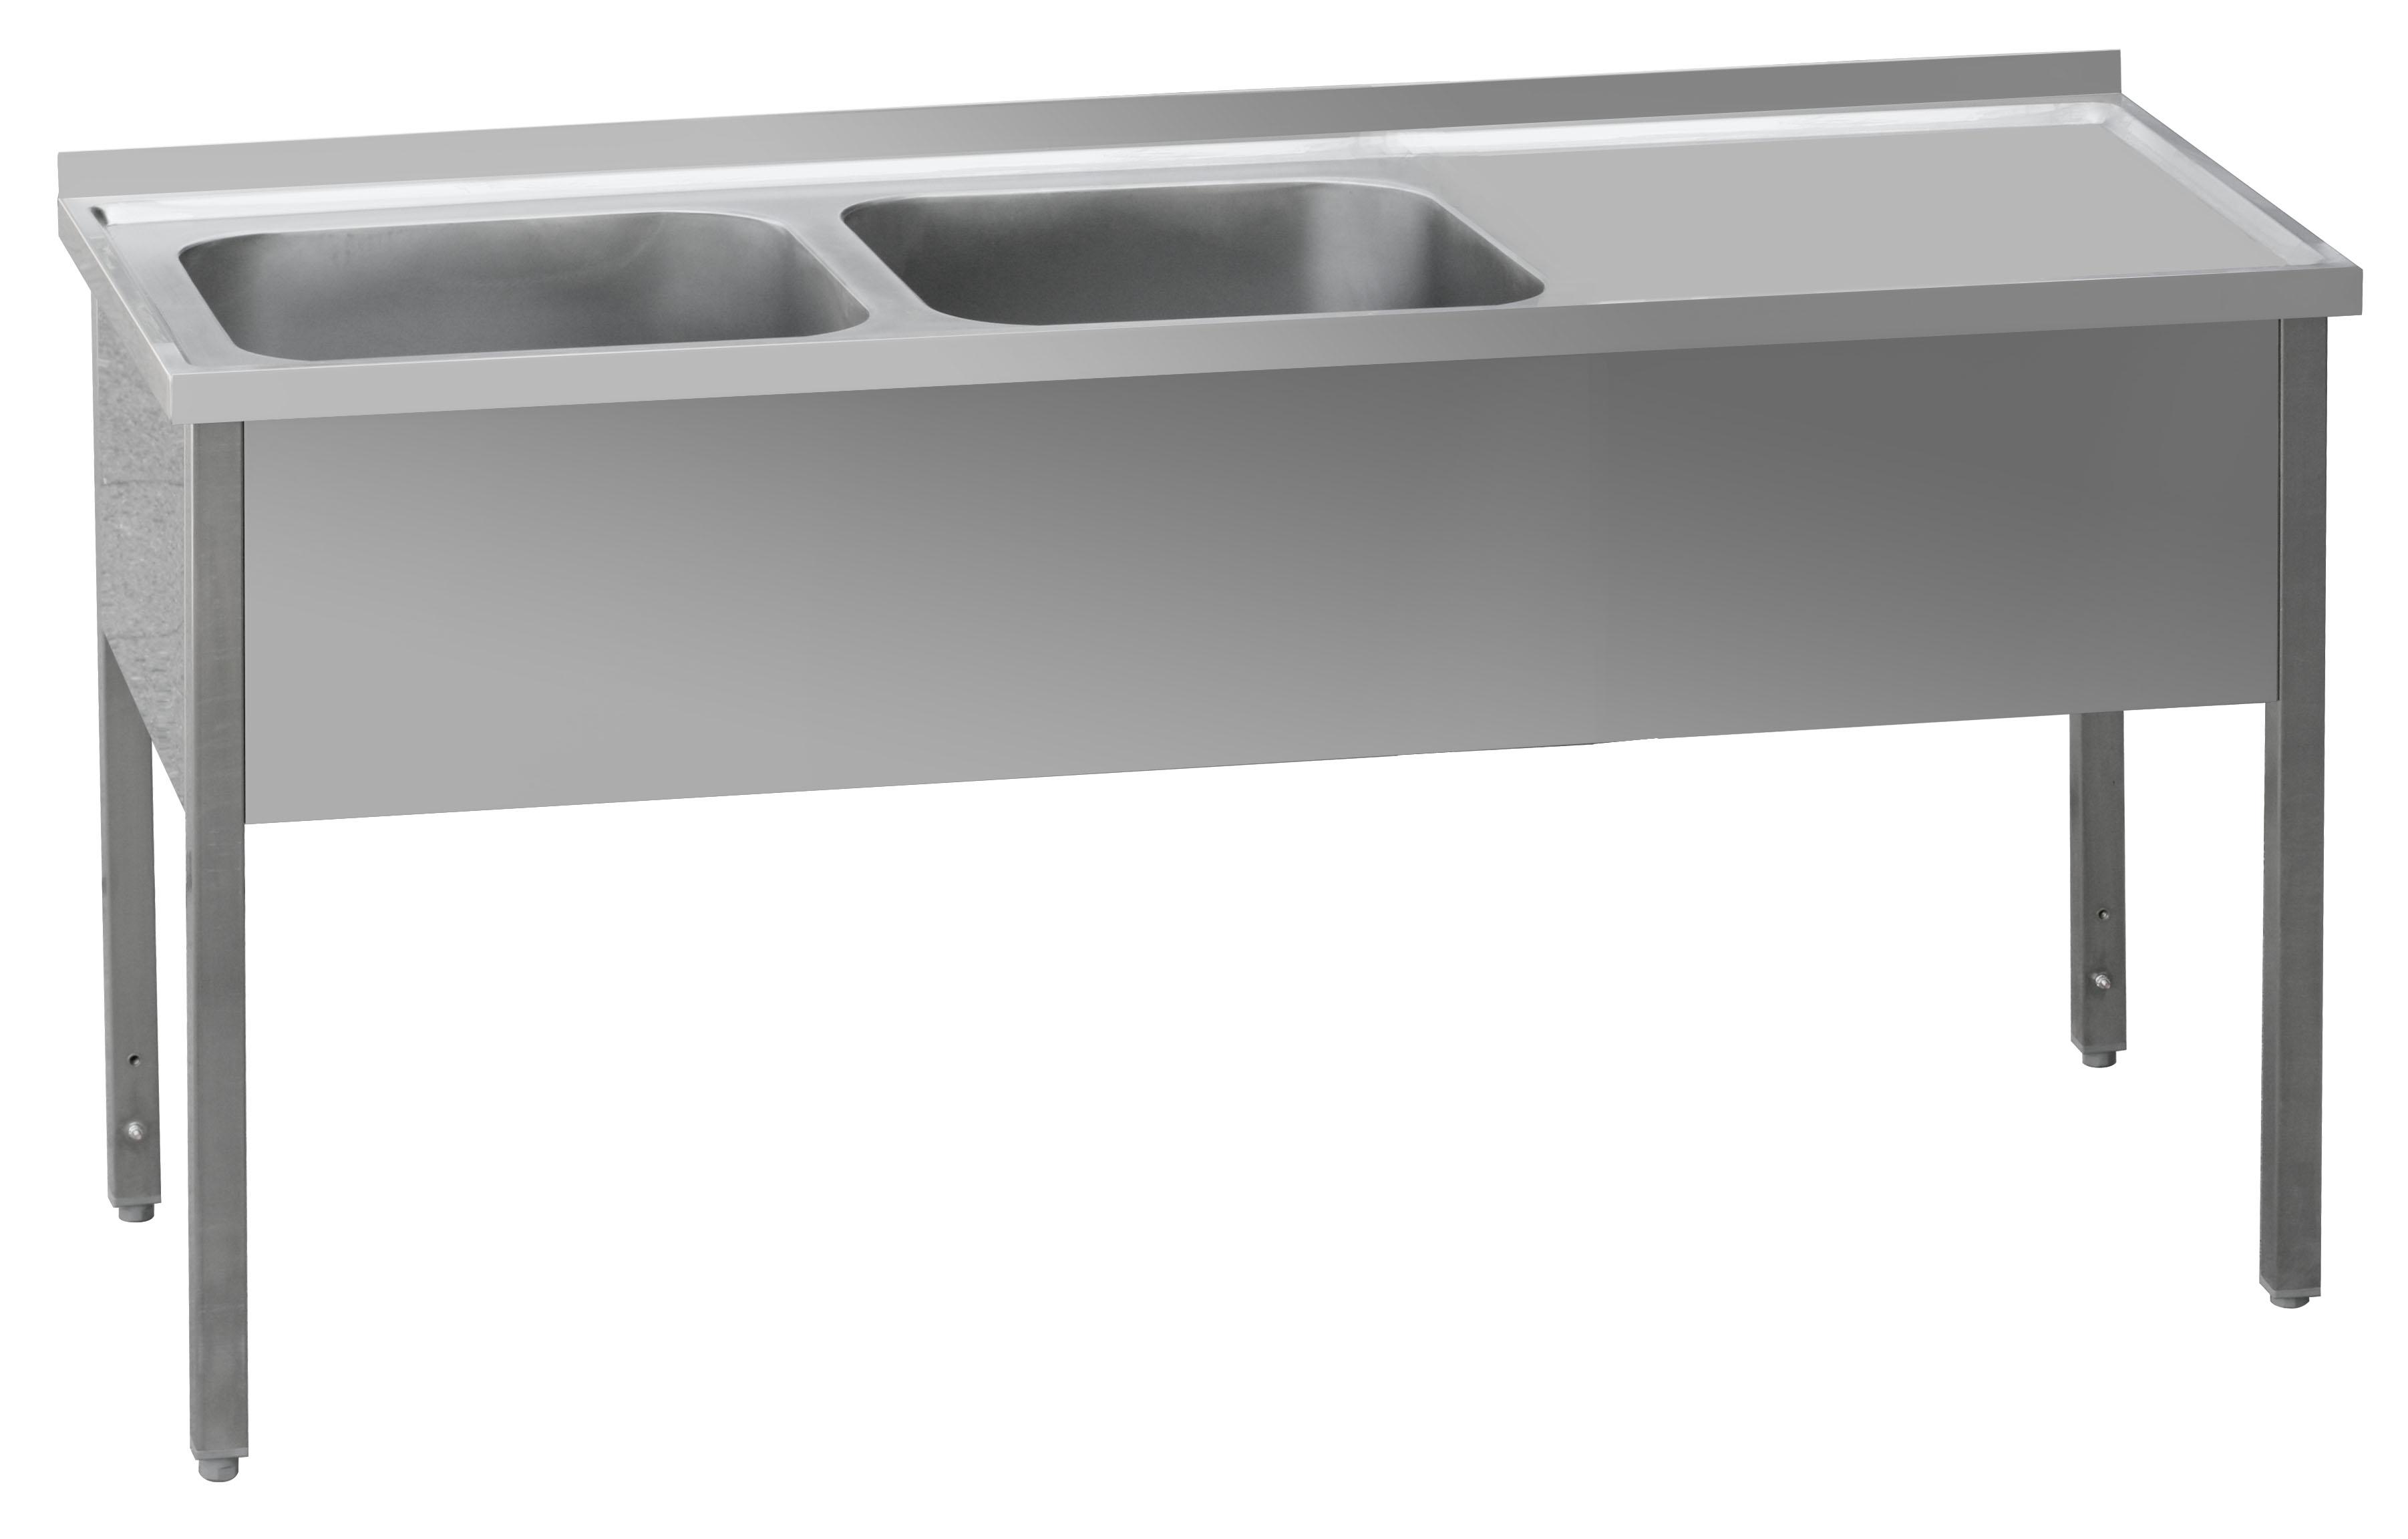 Stůl mycí dvoudřez MSDOP 210x70x90 REDFOX